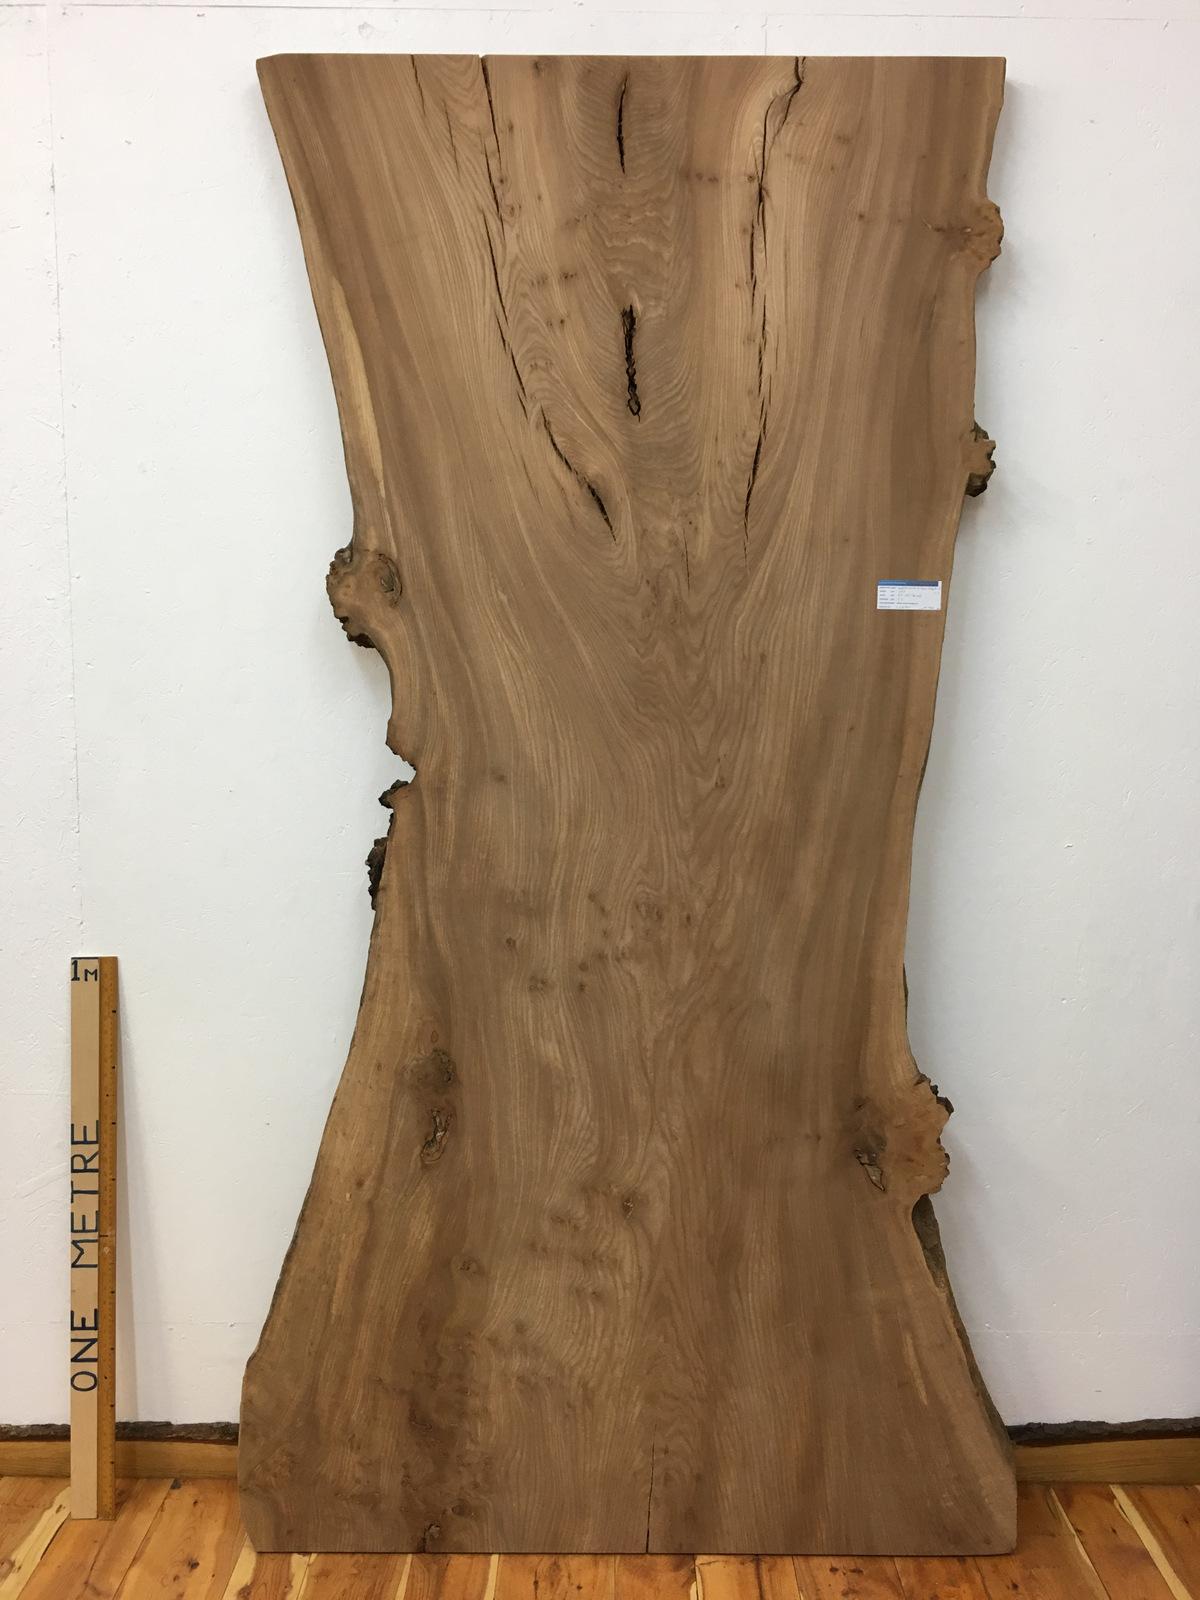 BURRY ELM Natural Waney Live Edge Slab Wood Board 1536A-9